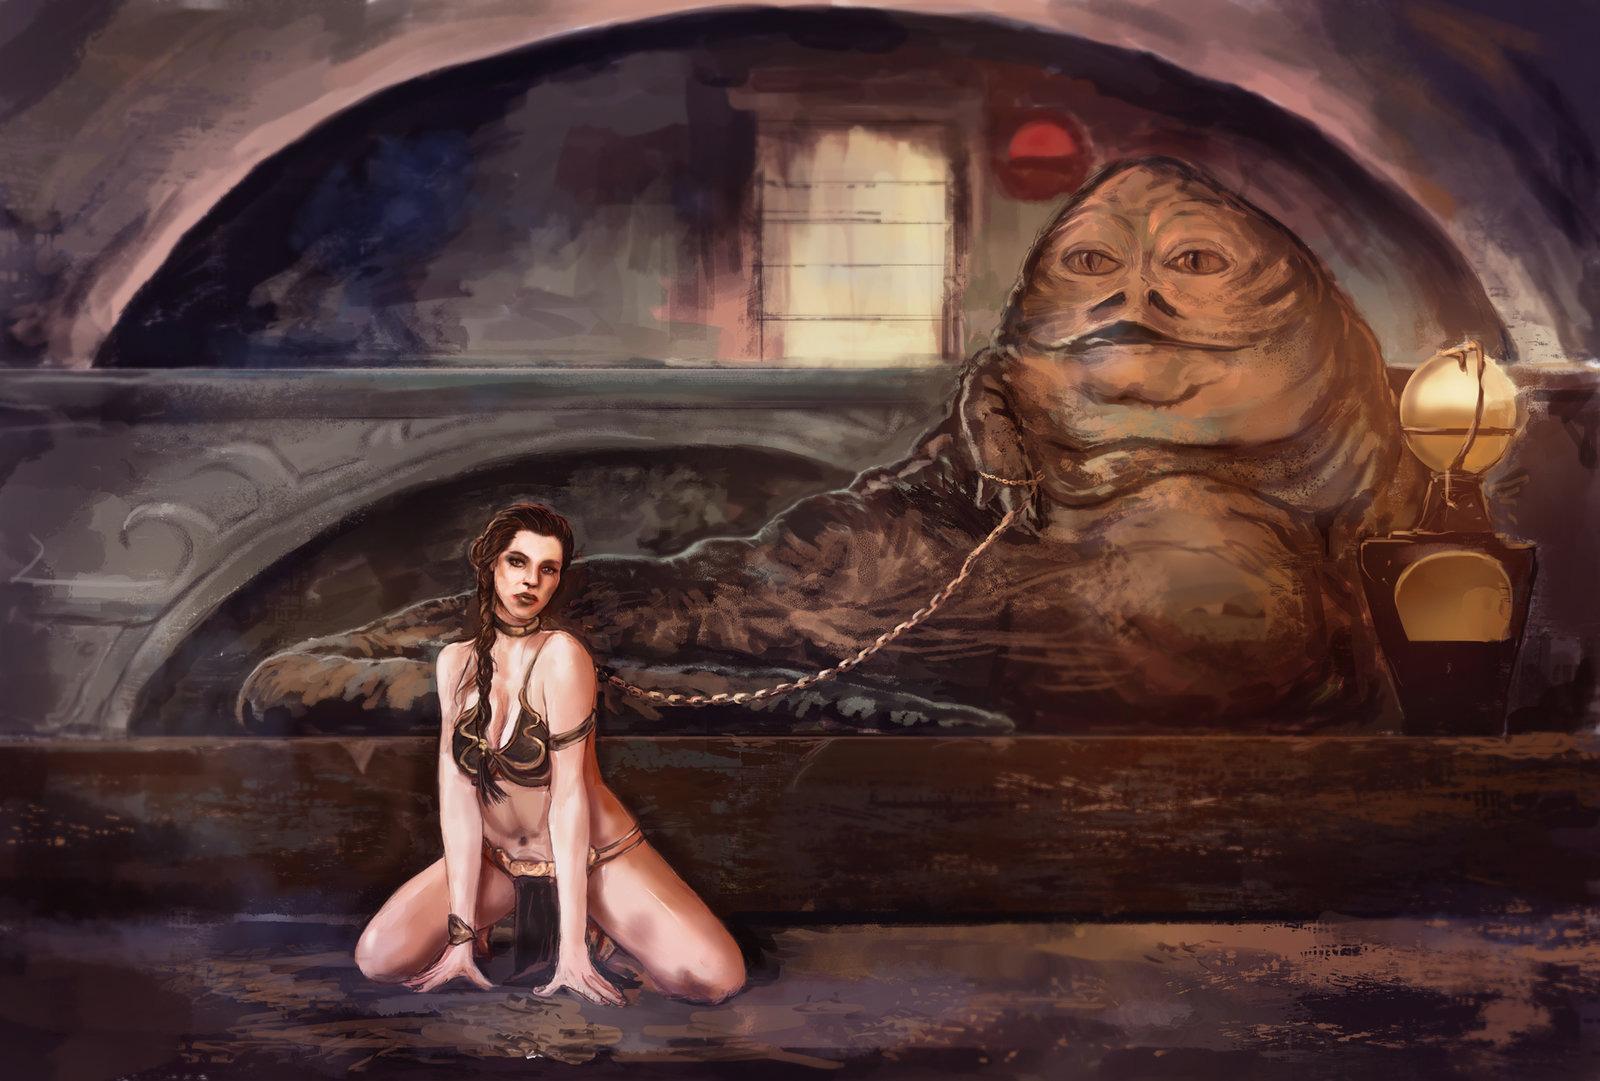 Jabba The Hutt Fucks Princess Leia Classy work is for the weak   telling it like it is